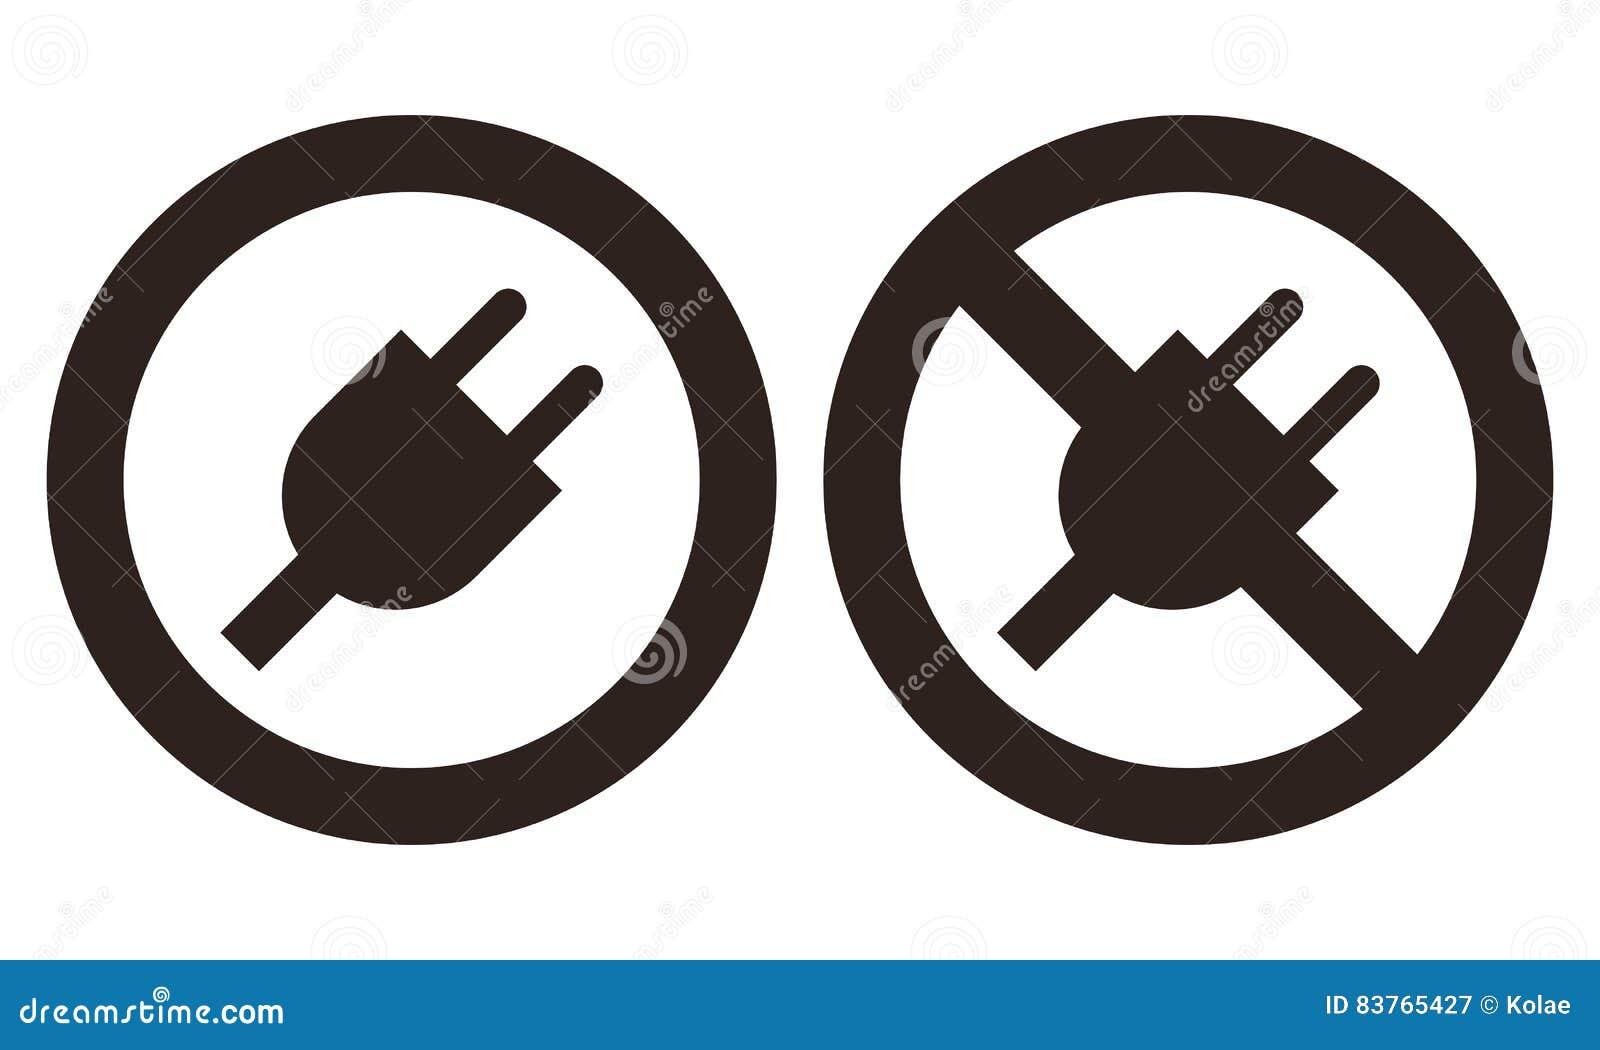 No plug icon stock illustrations 54 no plug icon stock plug and no plug symbol on white background royalty free stock photography buycottarizona